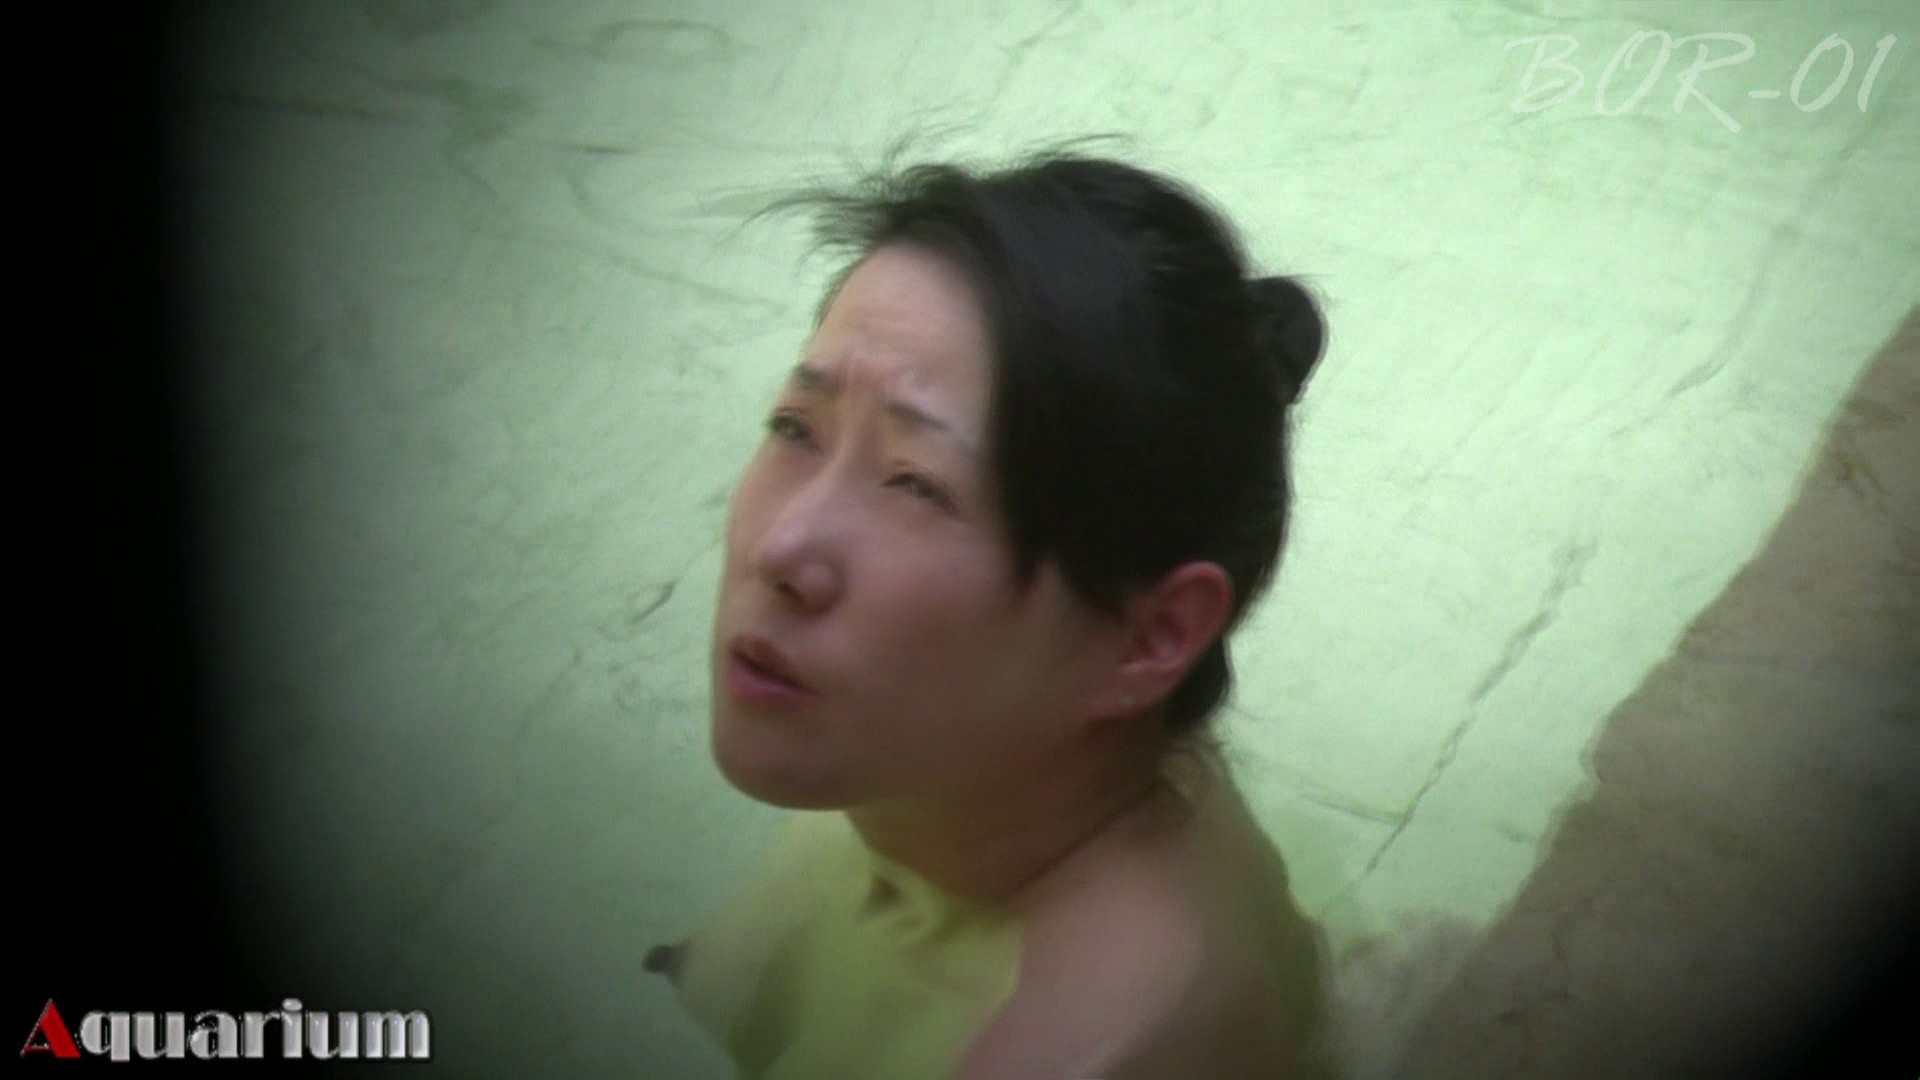 Aquaな露天風呂Vol.461 露天風呂 | OLのエロ生活  64連発 19